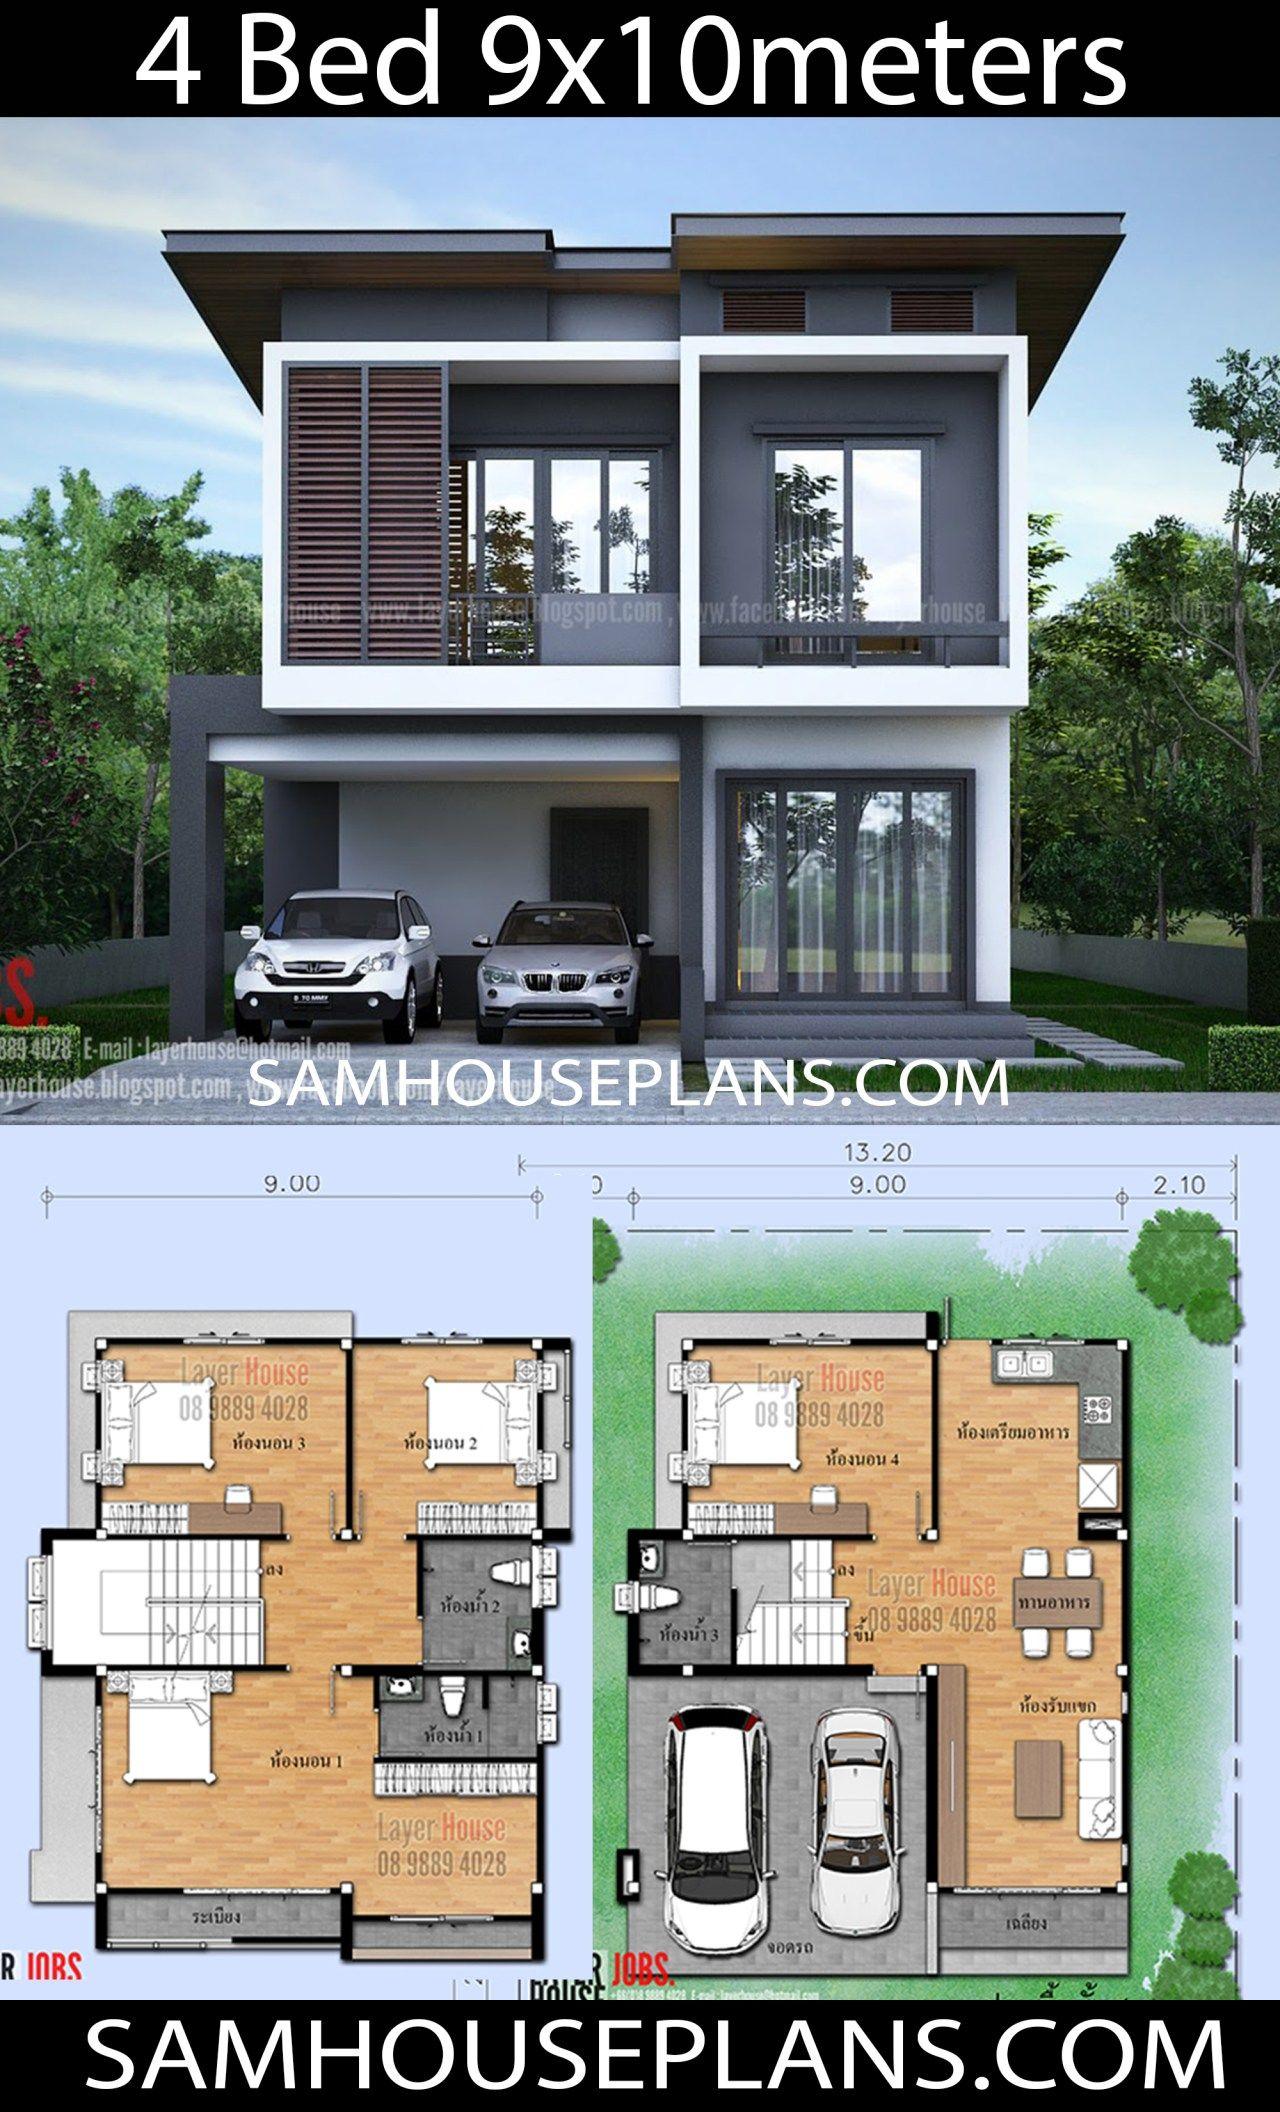 House Plans Idea 9x10m with 4 Bedrooms | Duplex house ...